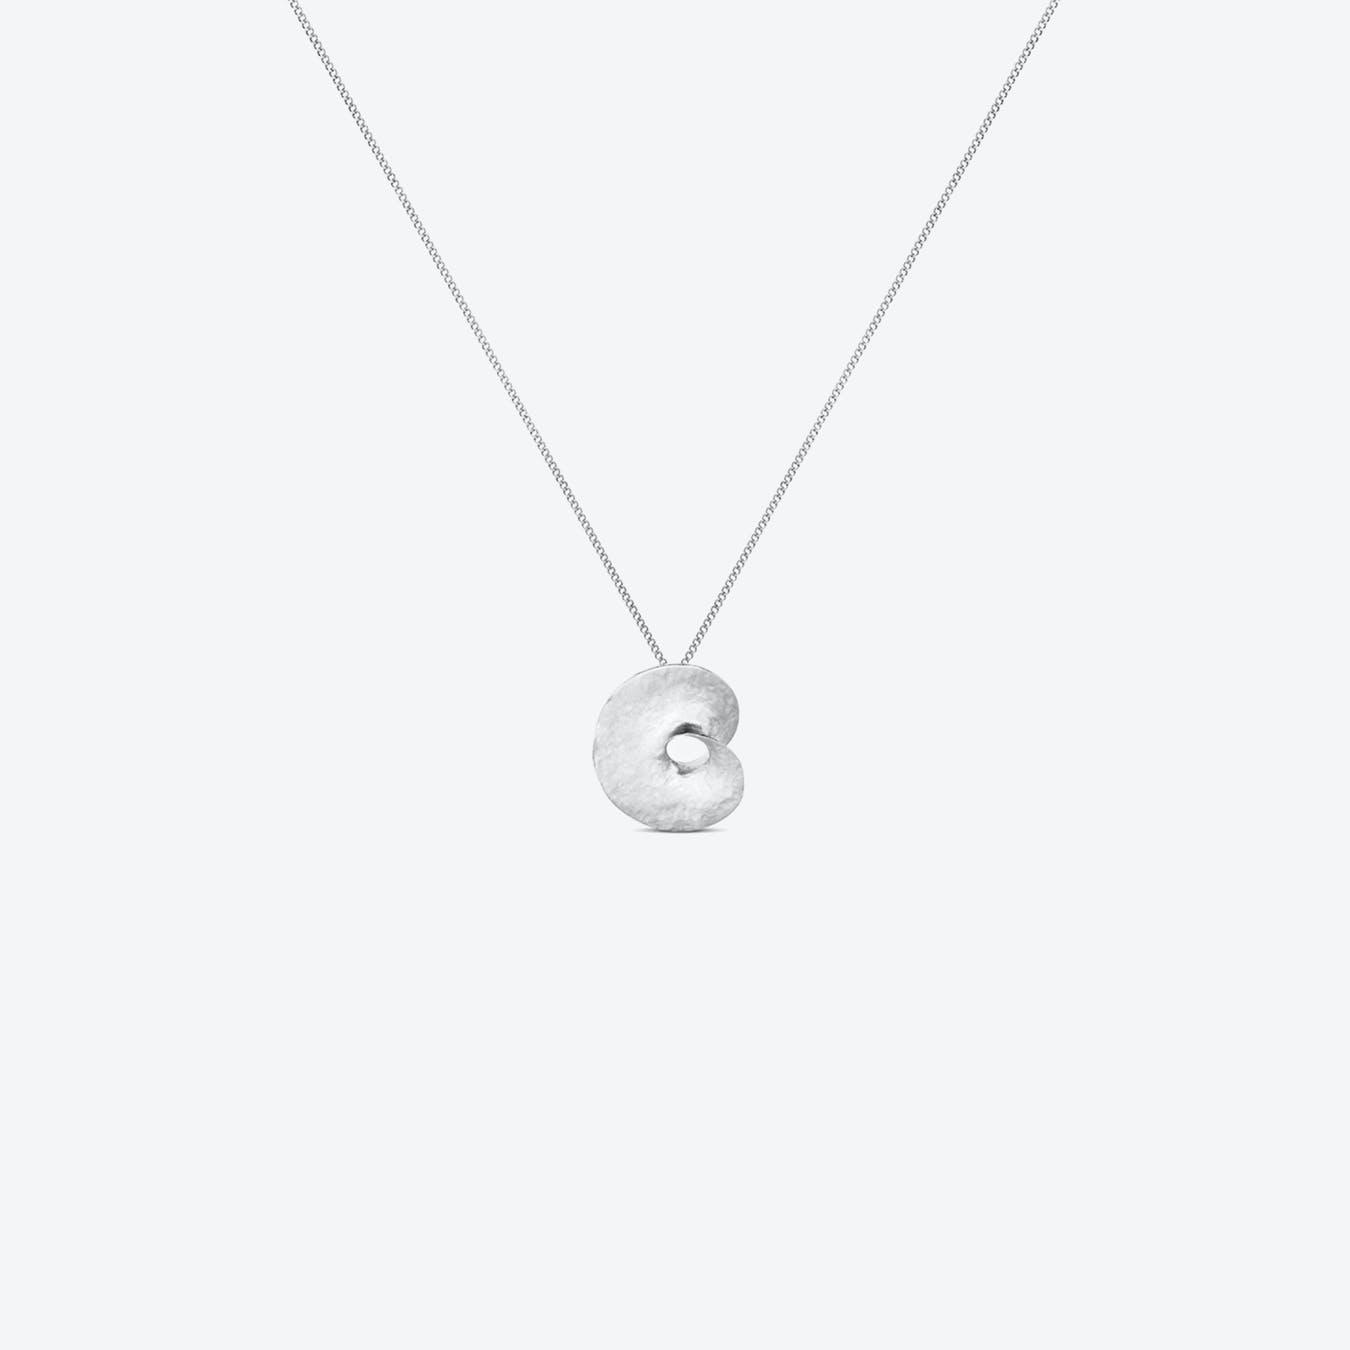 Silver Infinite Love Necklace